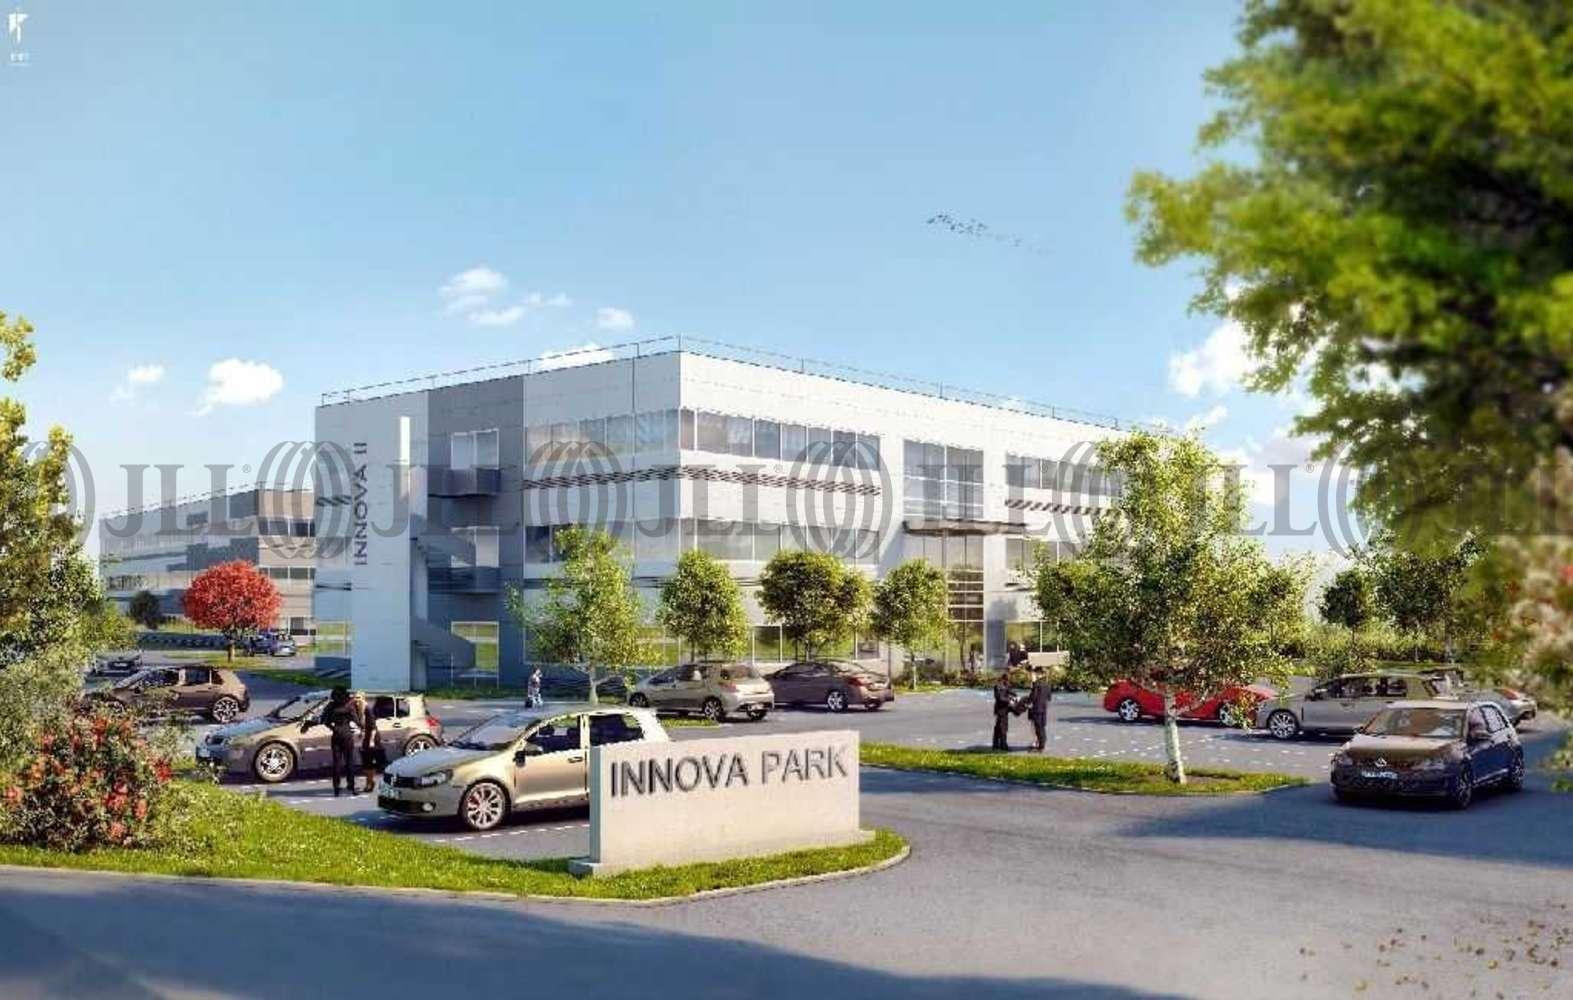 Bureaux Vaulx milieu, 38090 - INNOVA PARK - LOCATION BUREAUX - 9461751